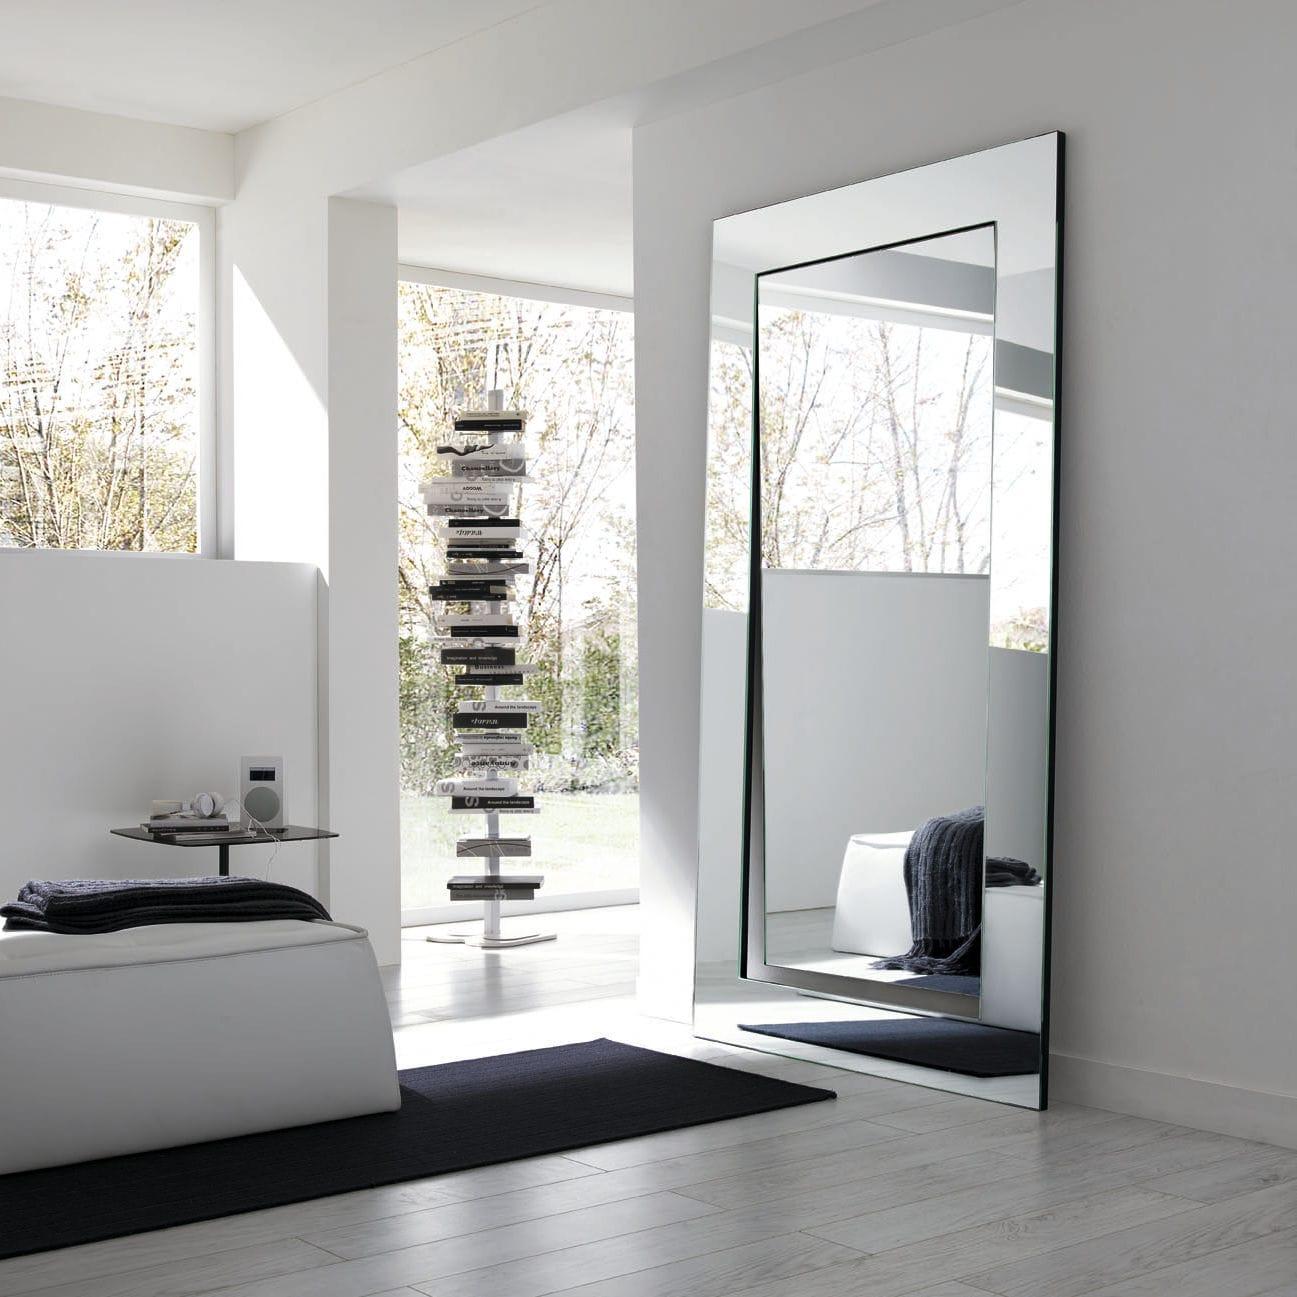 mirror wallmounted oval gerundio by giovanni tommaso garattoni